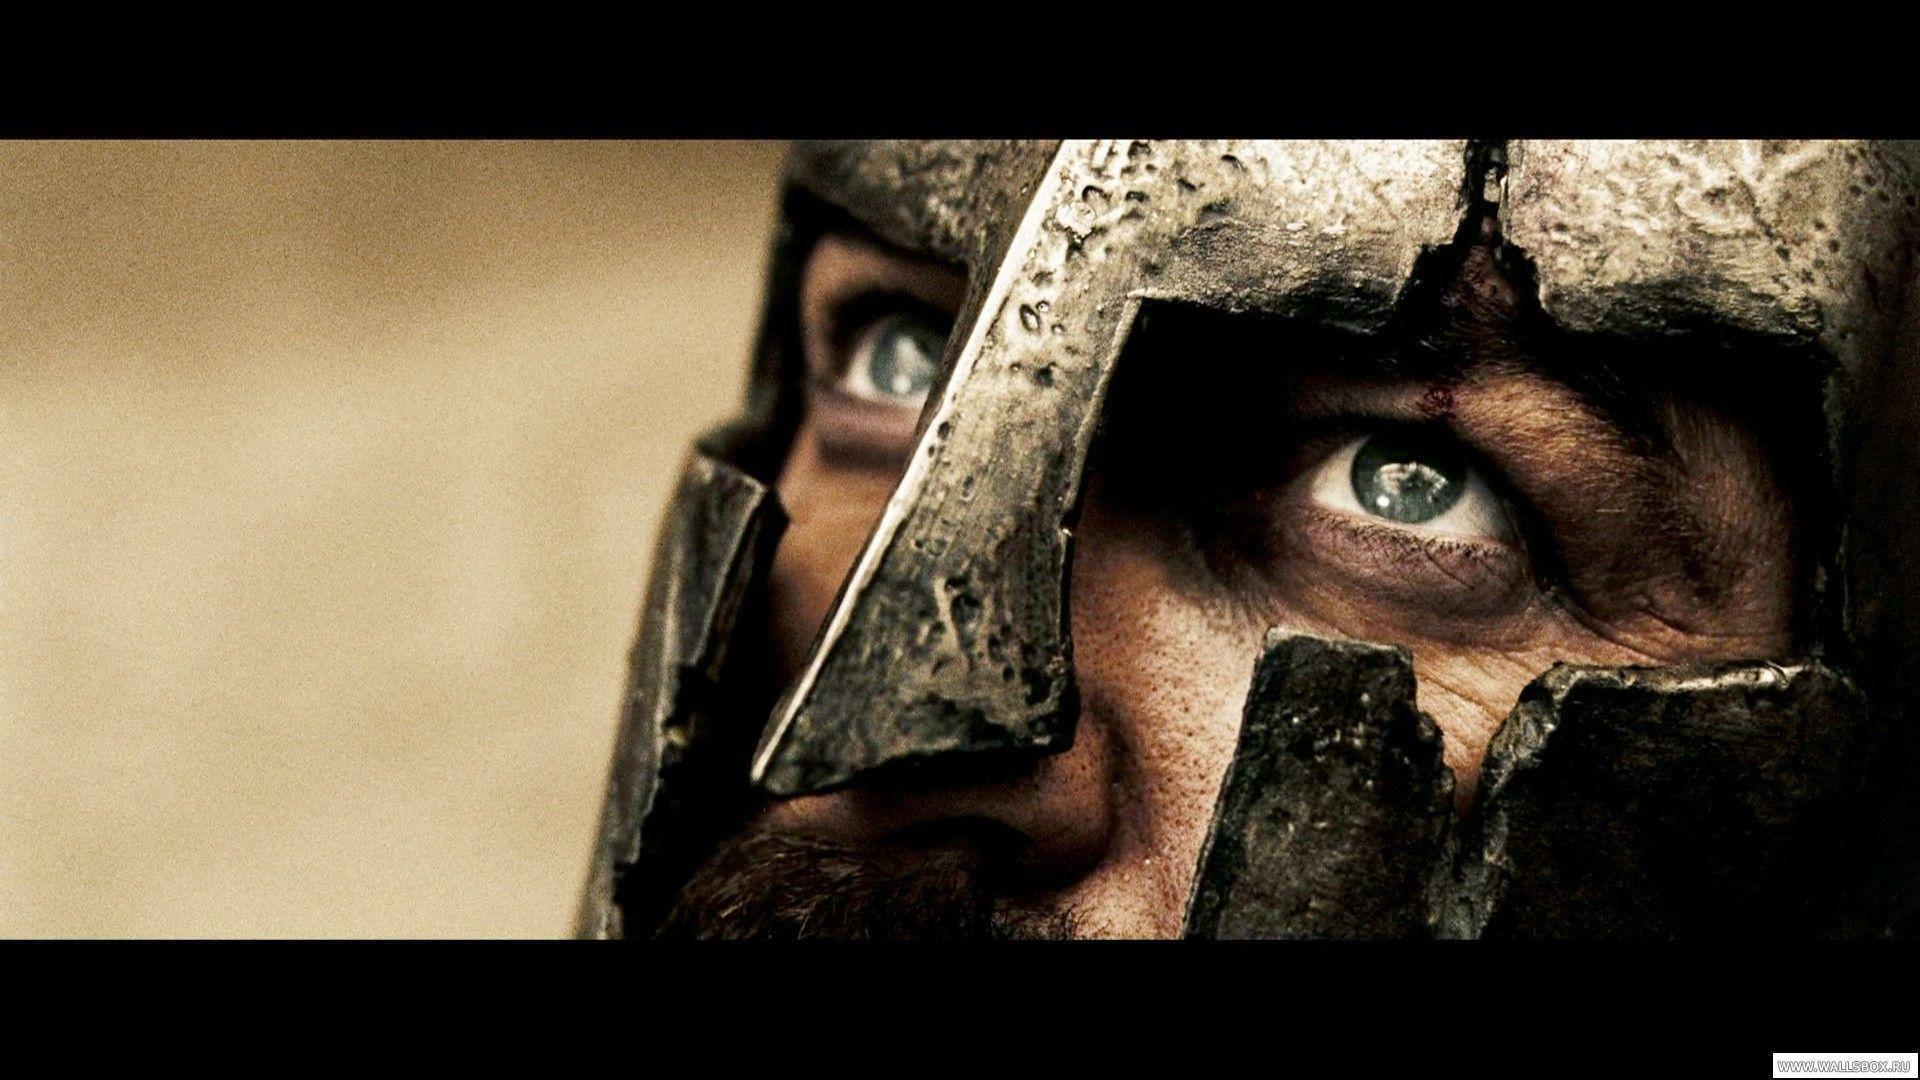 300 spartans wallpaper (57+ images)